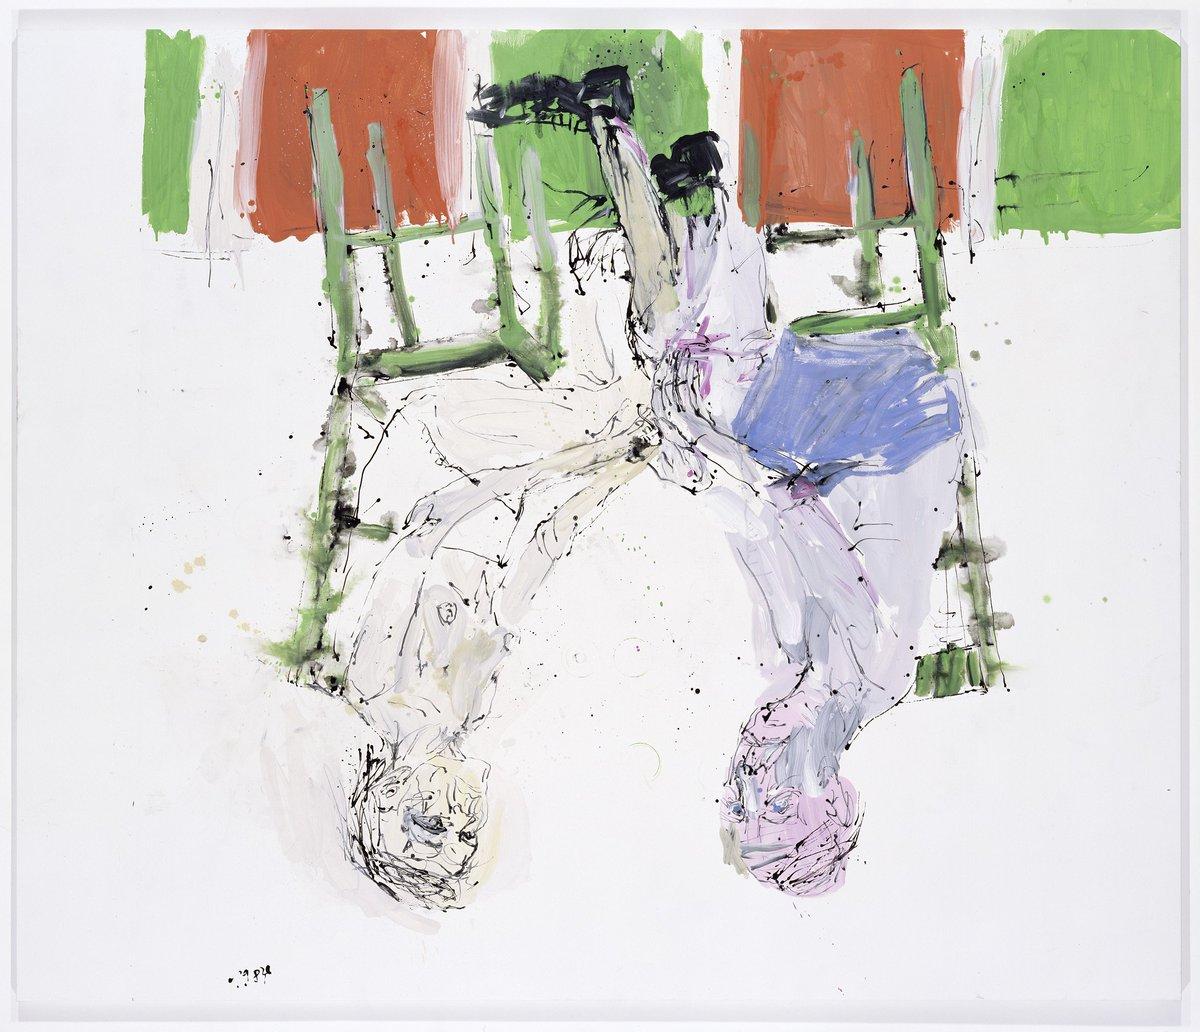 Georg Baselitz Remix Paintings